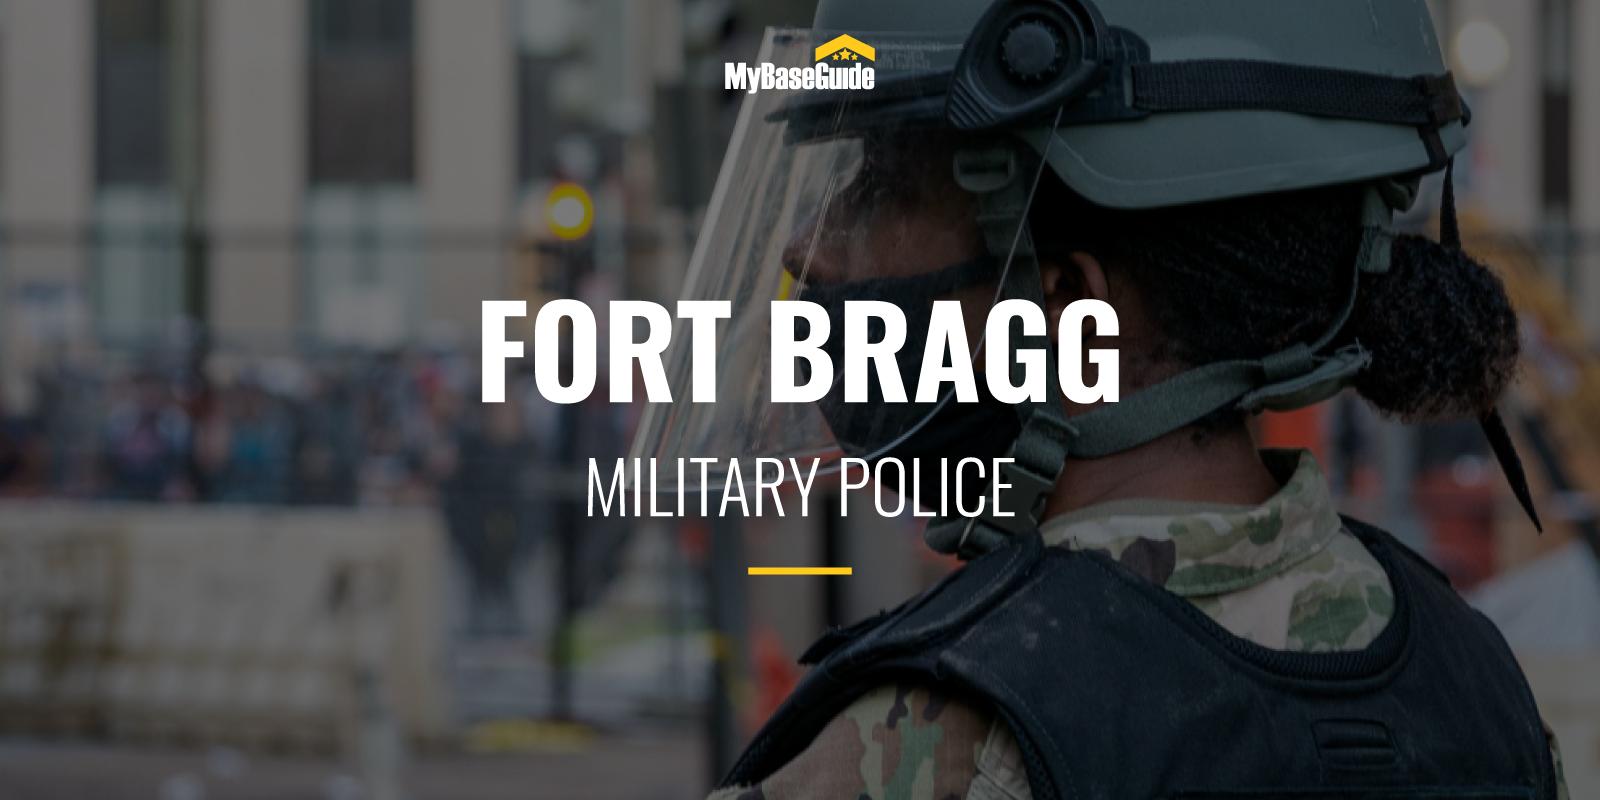 Fort Bragg Military Police